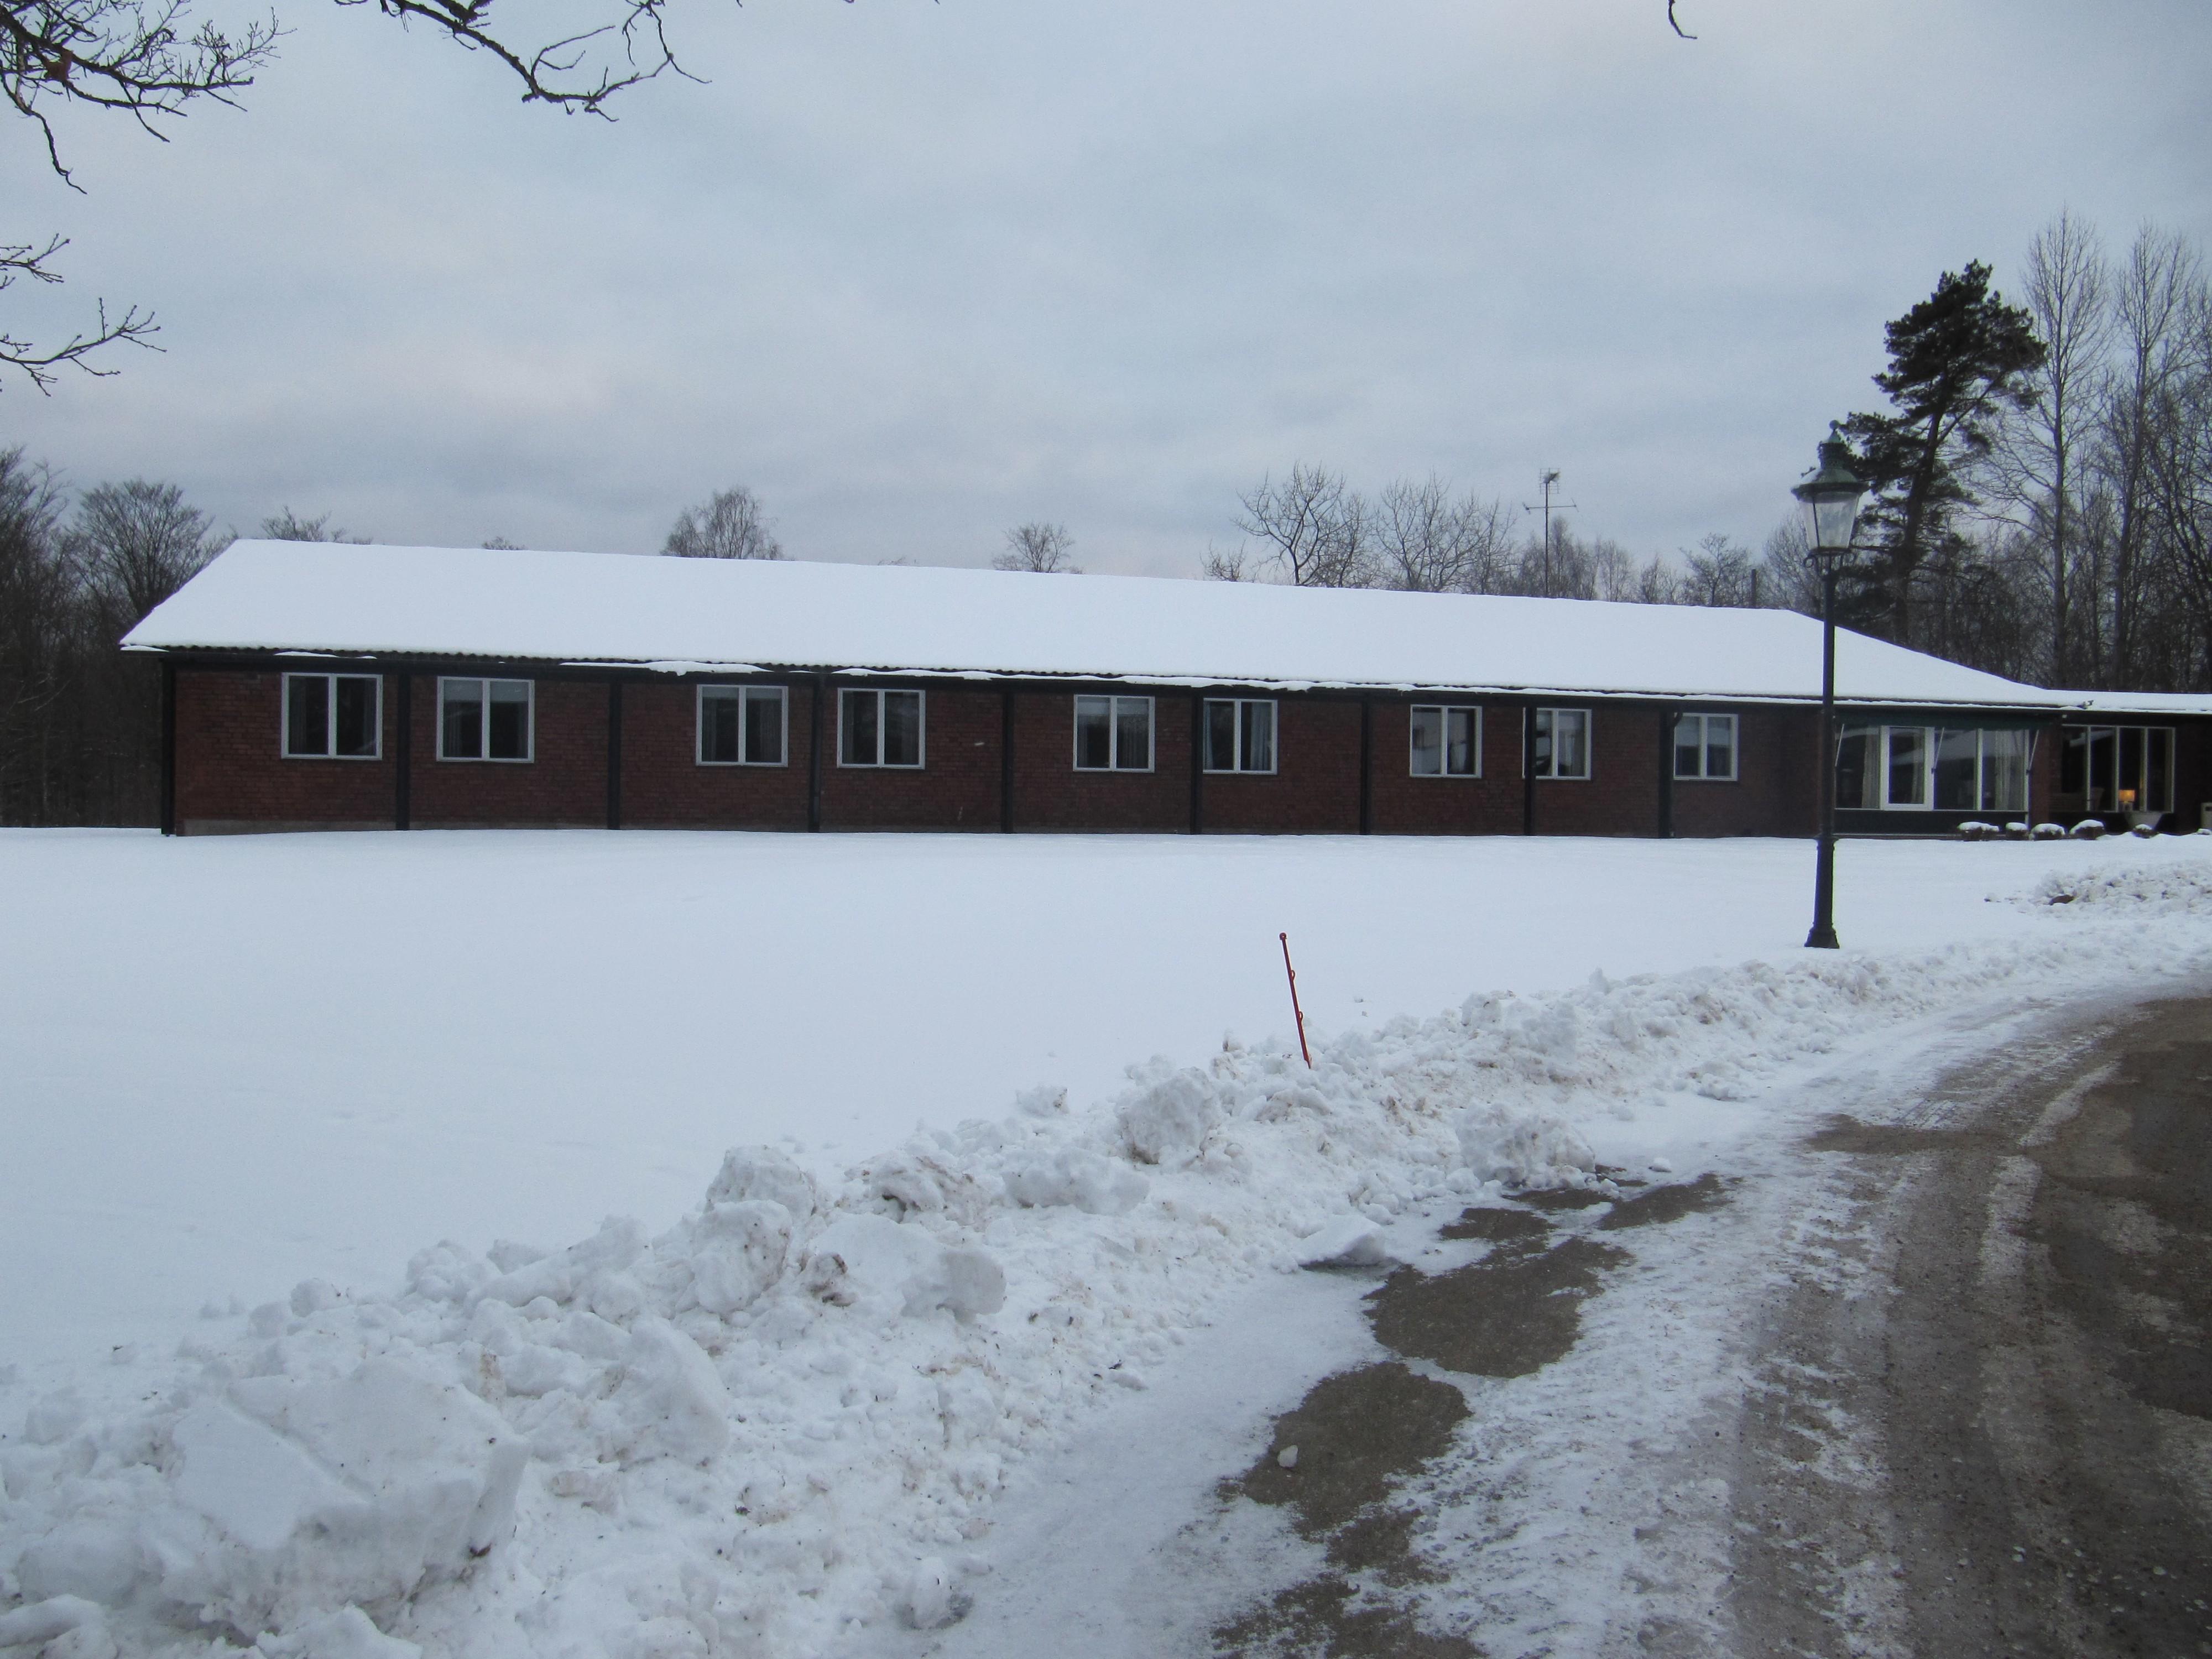 rkelljunga Semesterbostder och boenden - Skne, Sverige